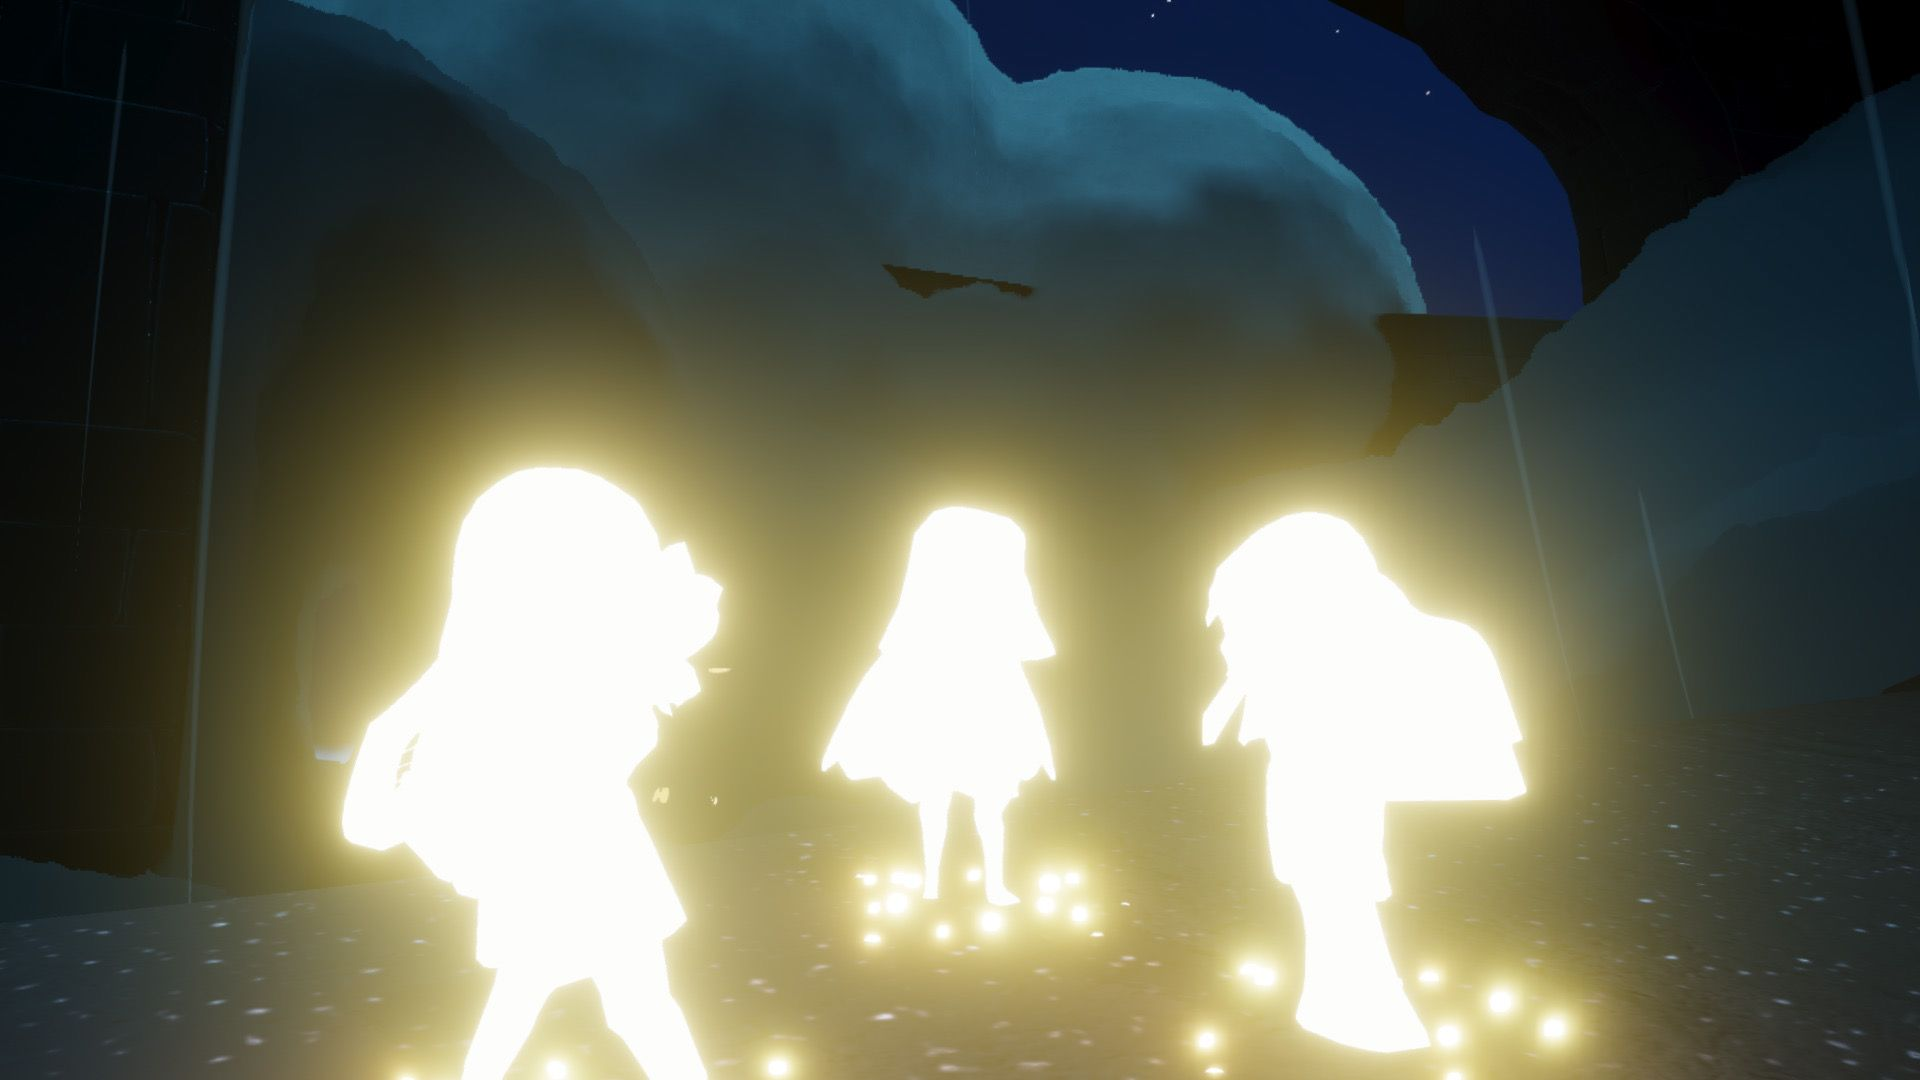 Charlie S Angels Novelty Lamp Lamp Charlie S Angels